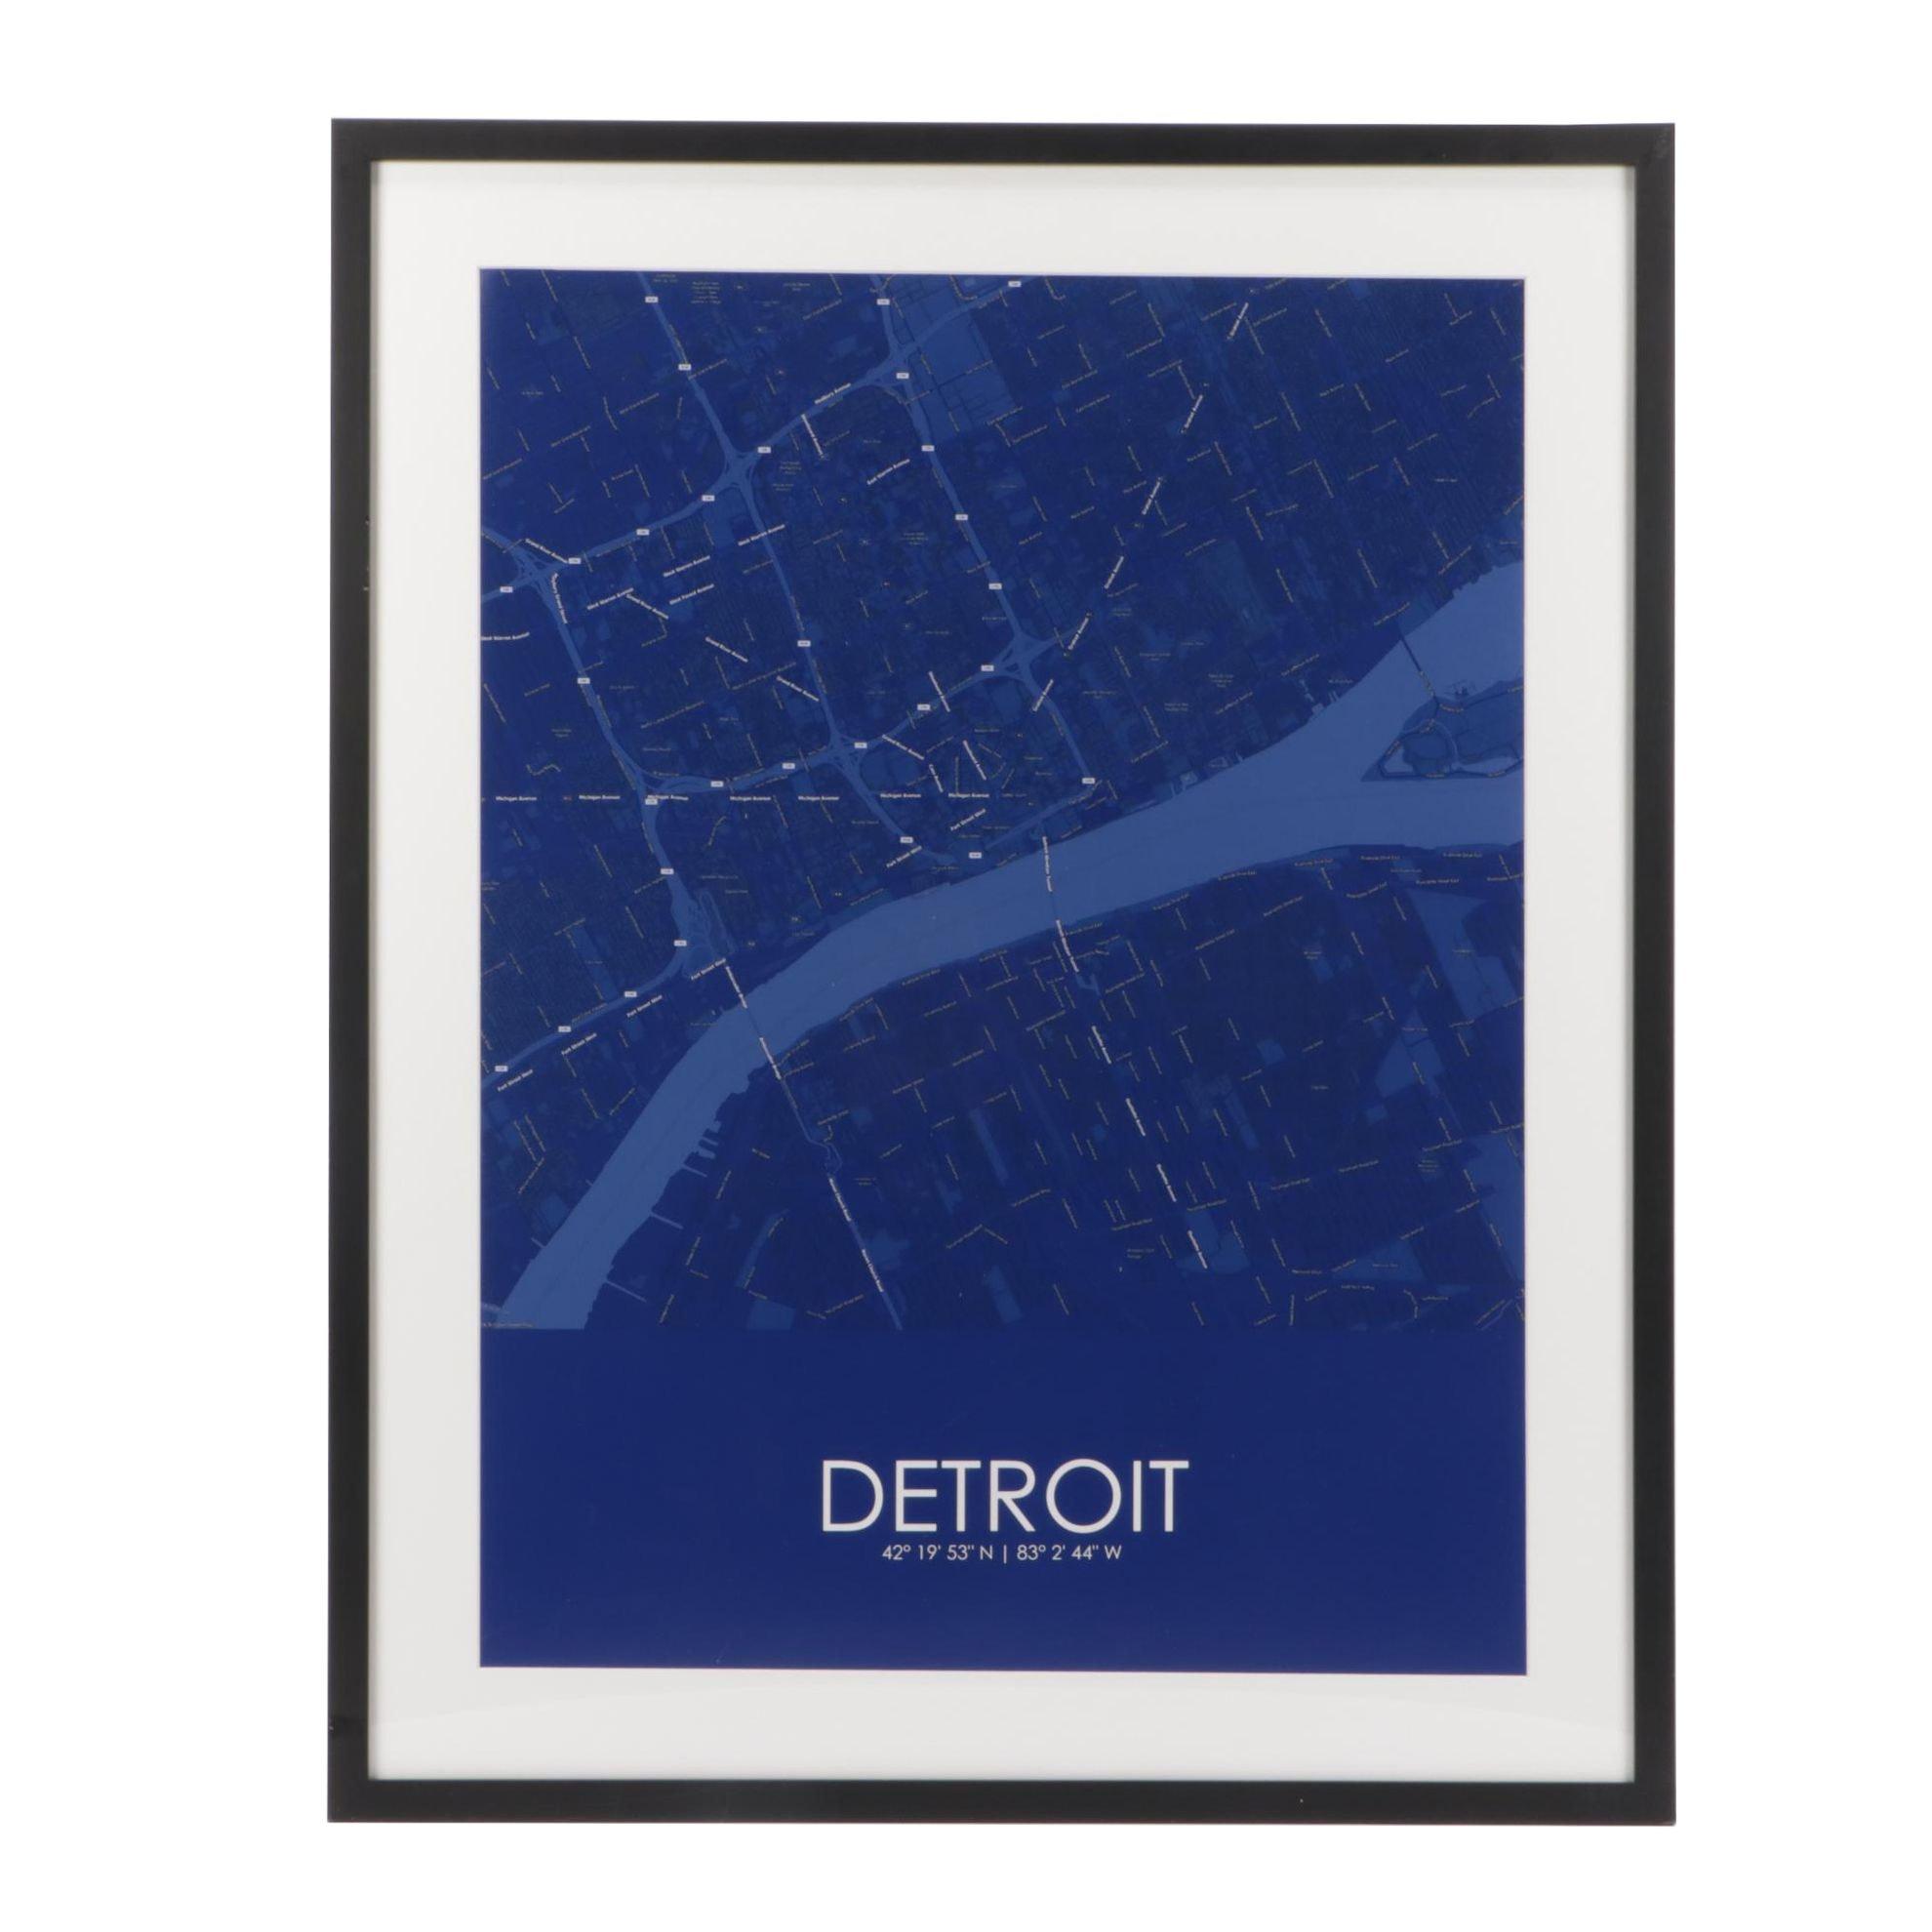 Digital Photographic Print of City Street Plan for Detroit